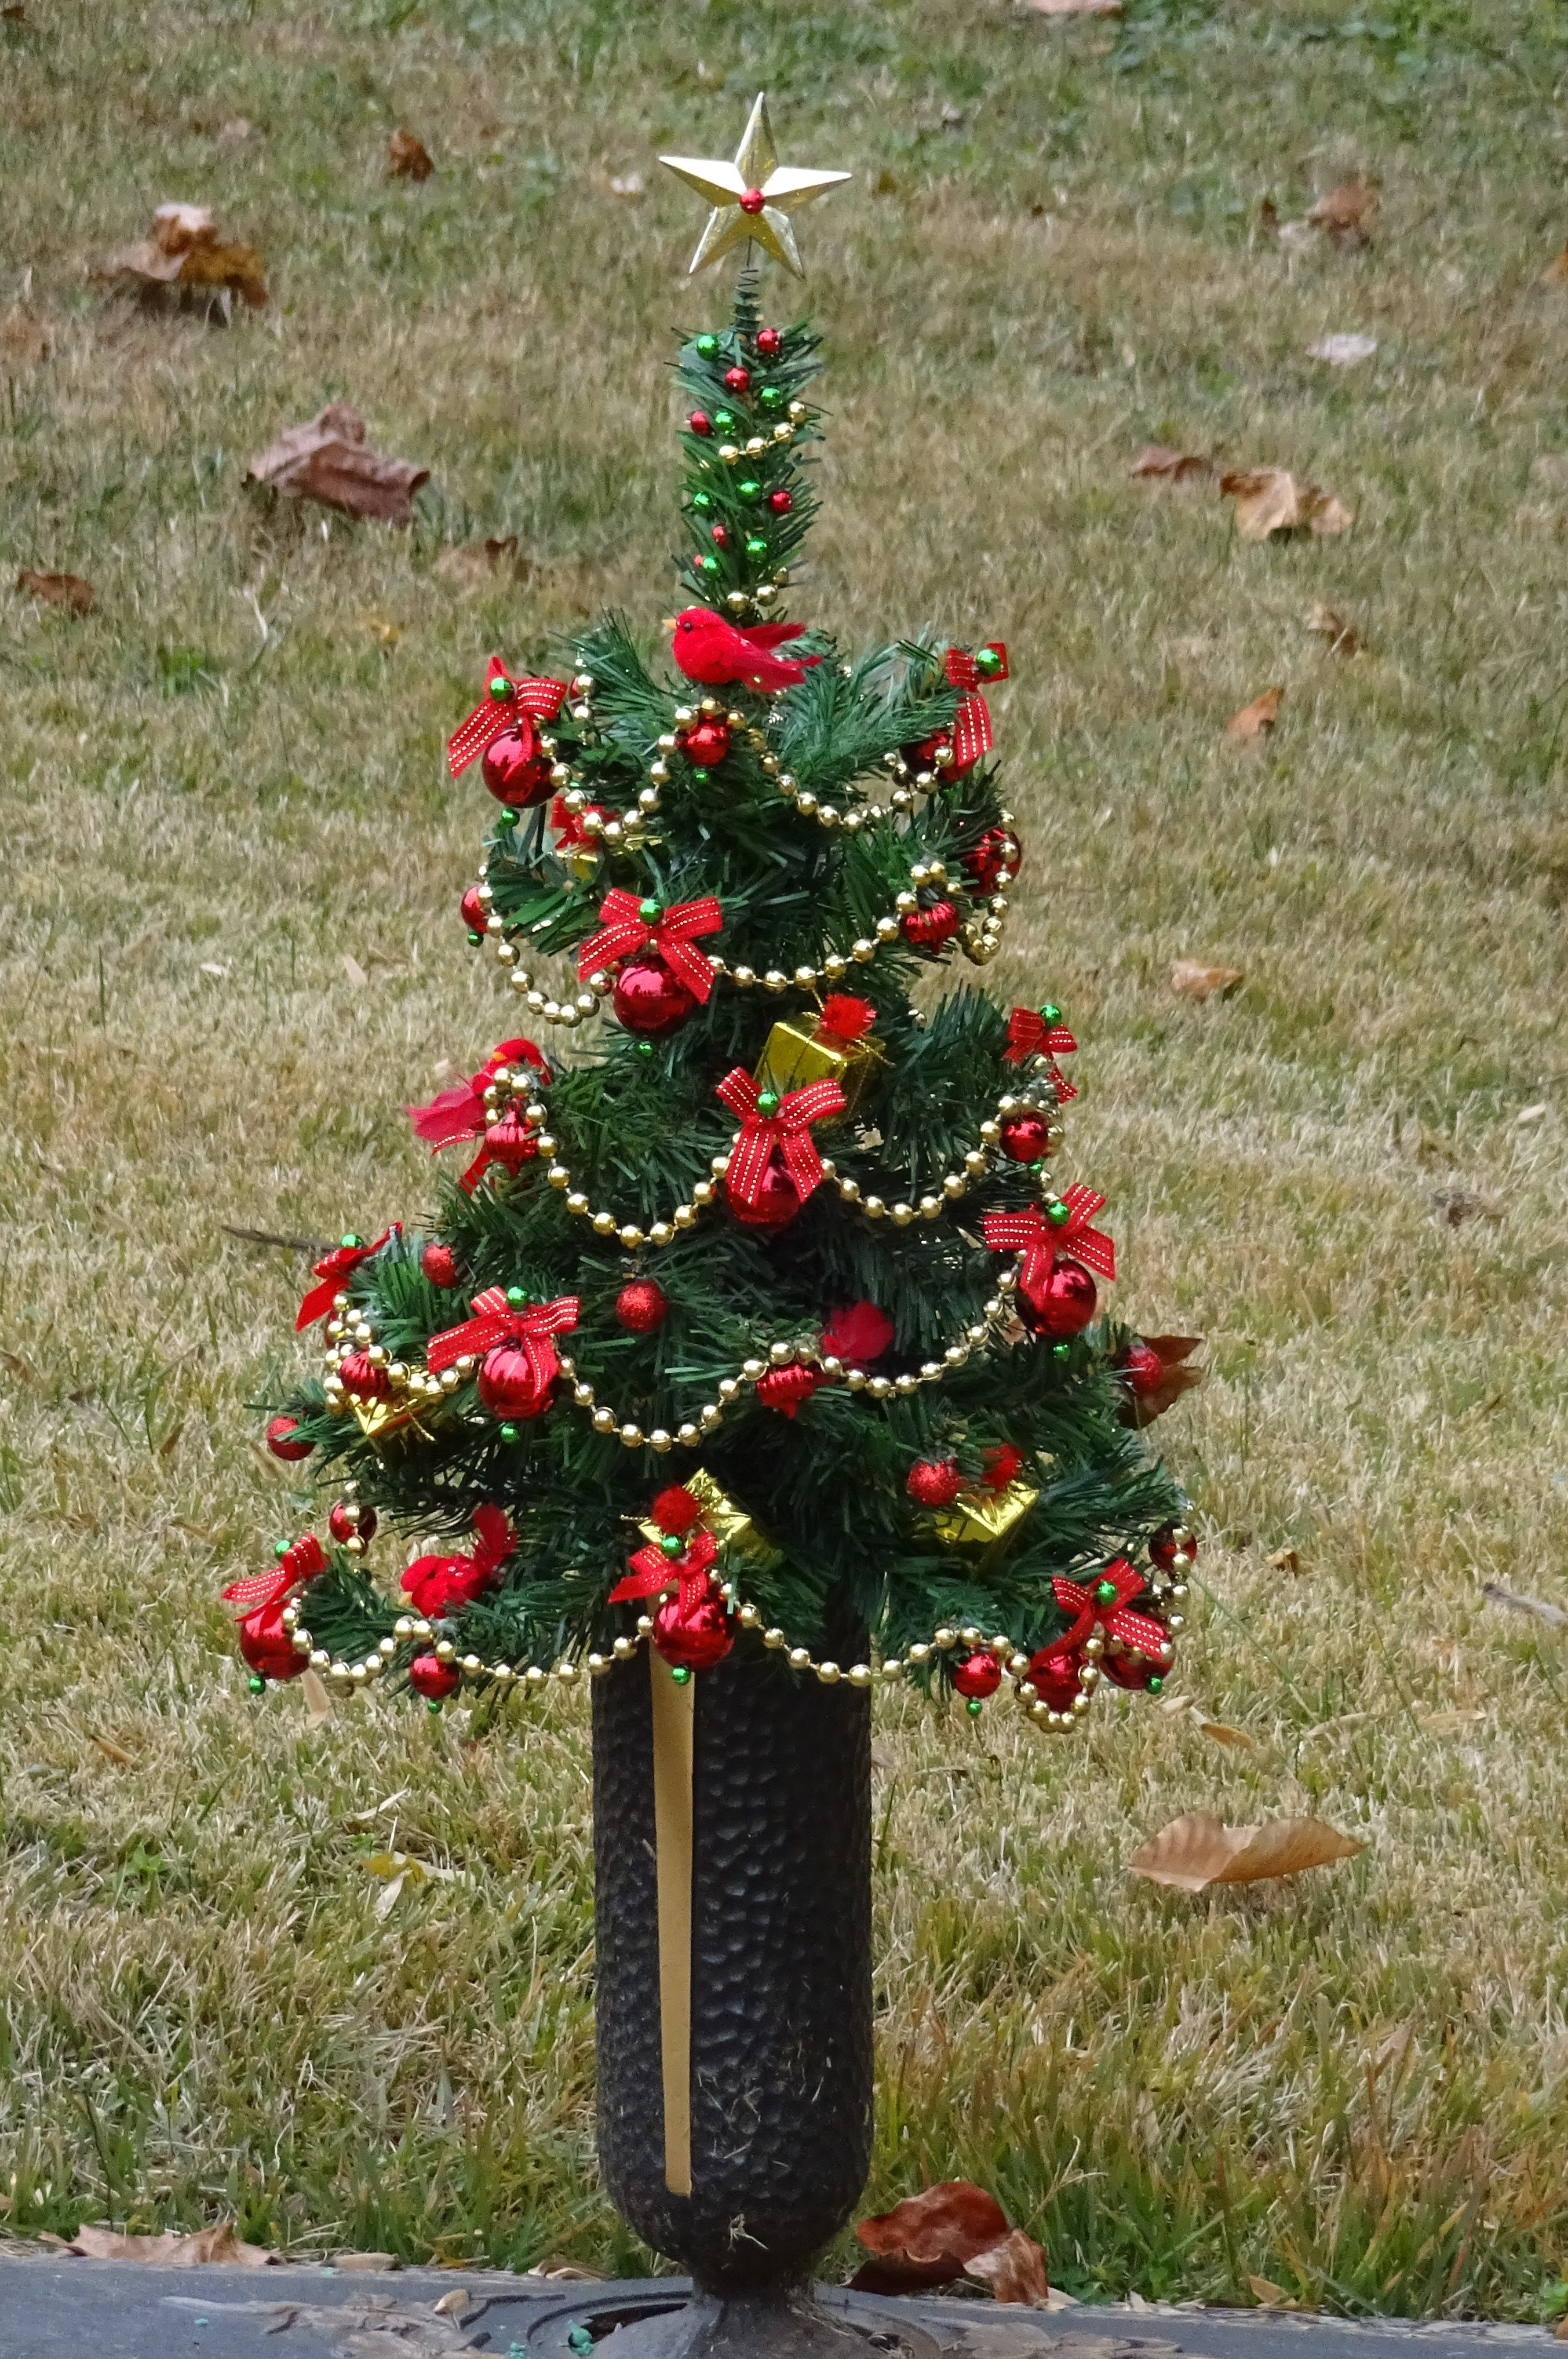 Cemetery Vase Christmas Tree Cemetary Decorations Memorial Flowers Cemetery Decorations